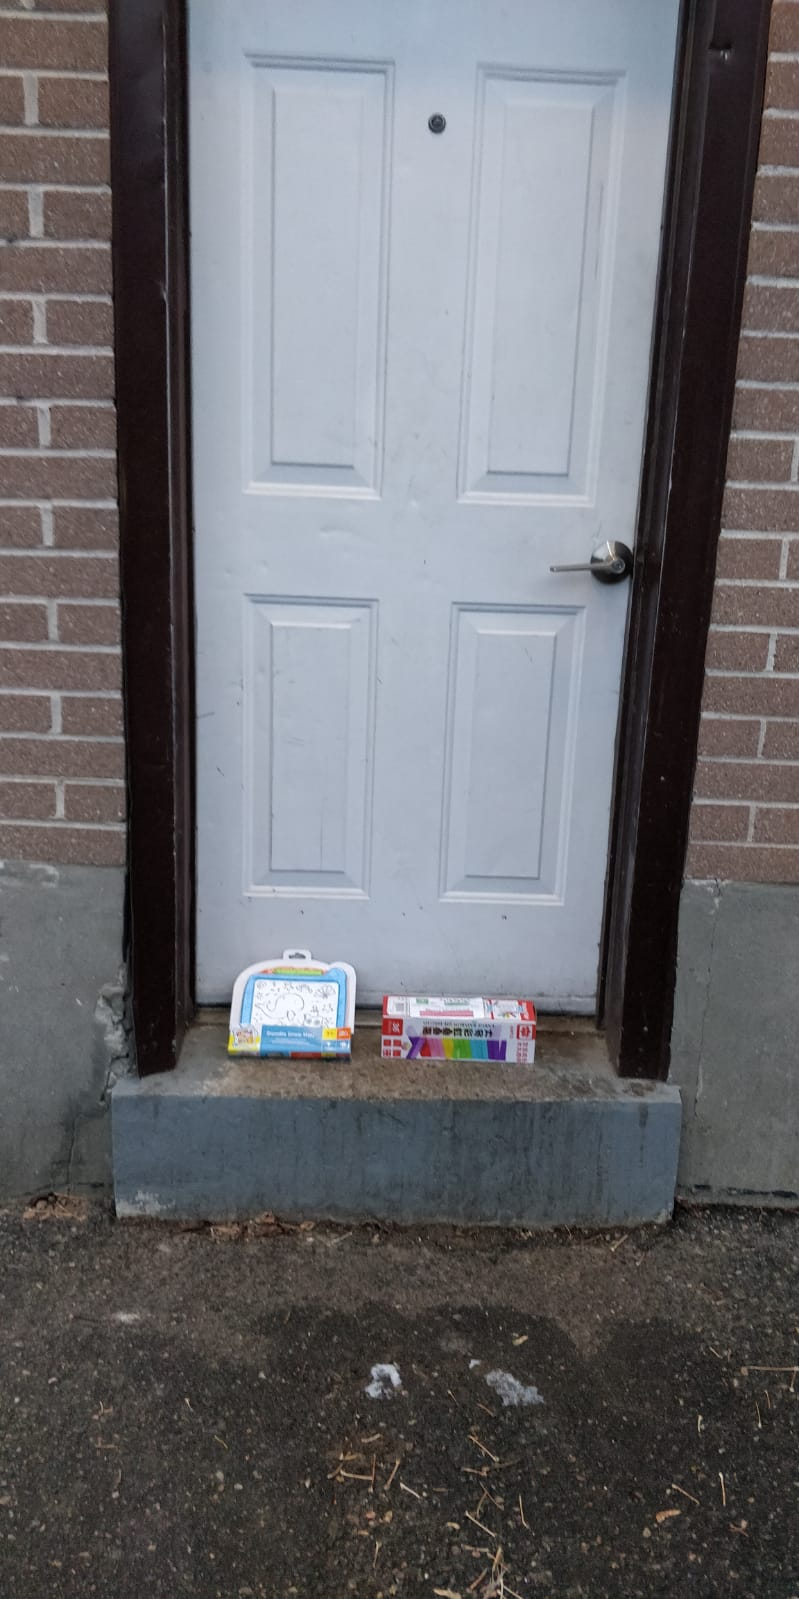 Building Block and mini writing board for preschooler